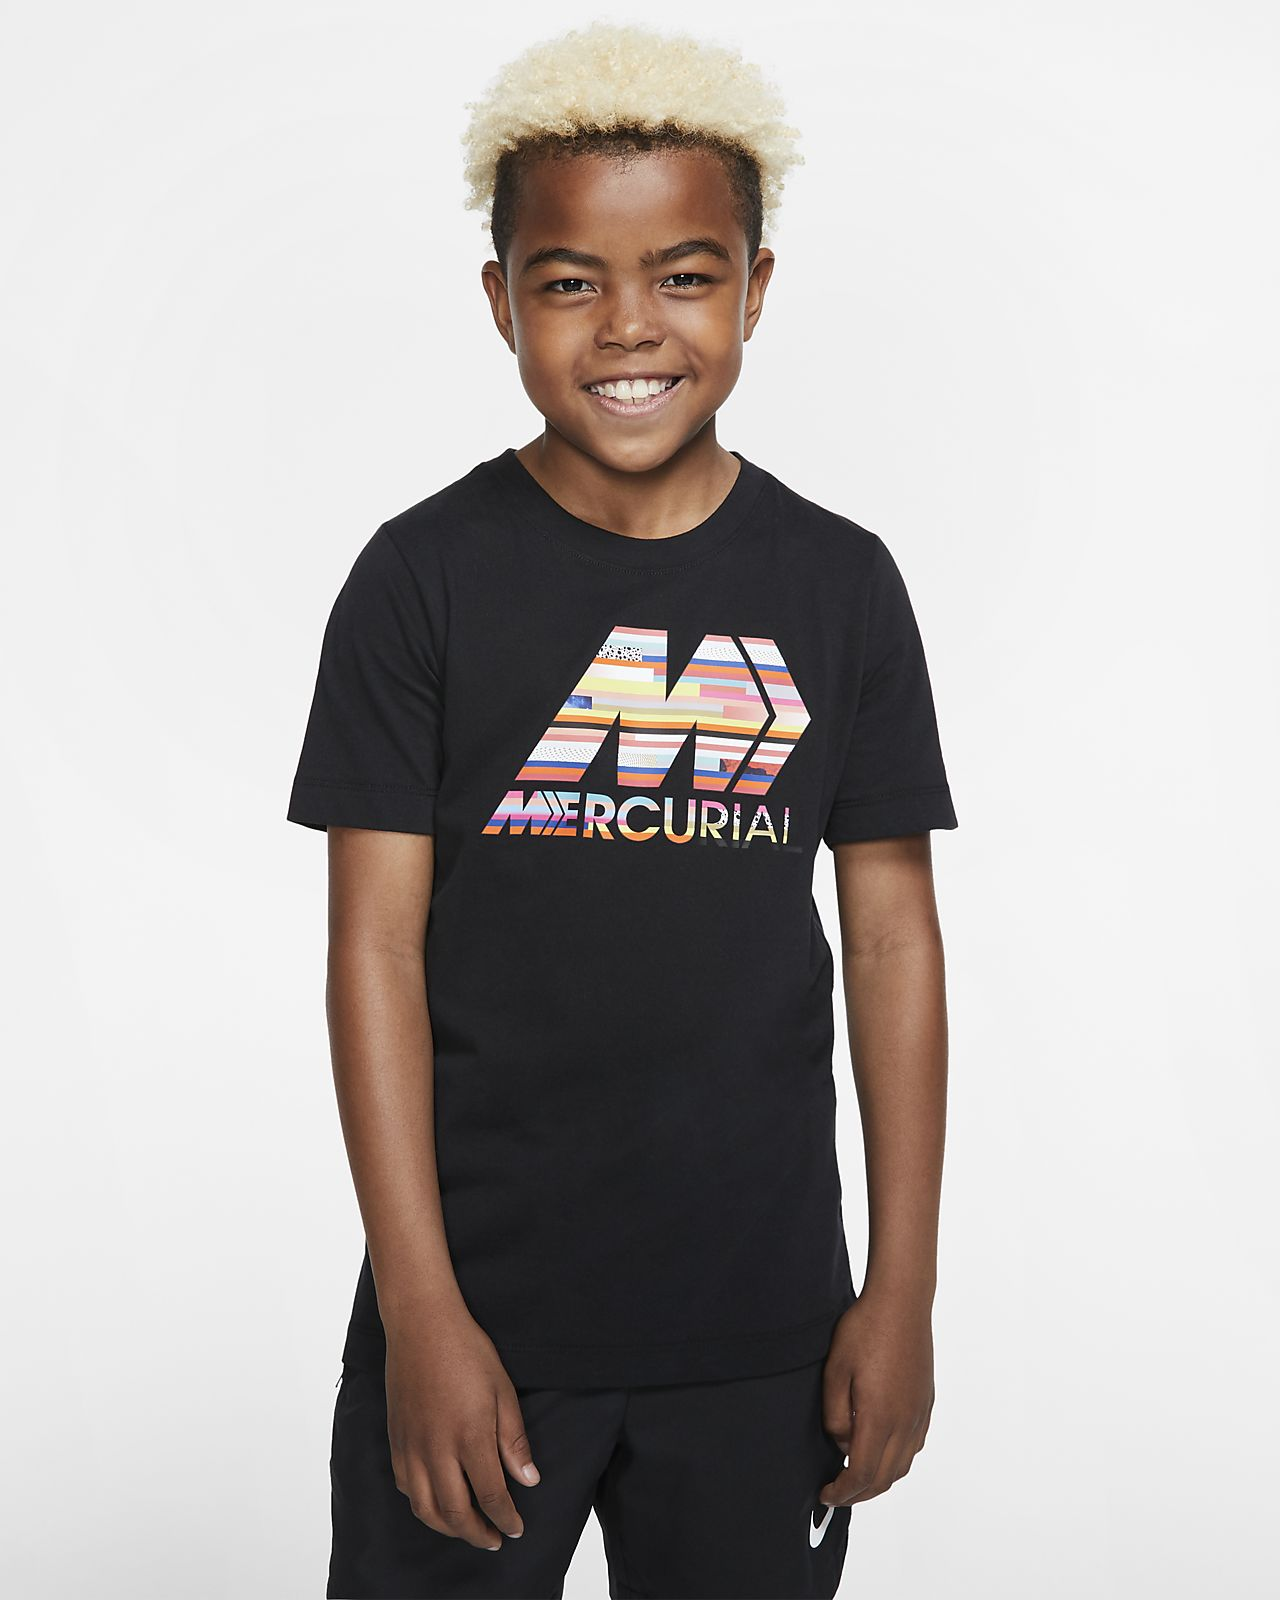 T-shirt de futebol Nike Dri-FIT Mercurial Júnior